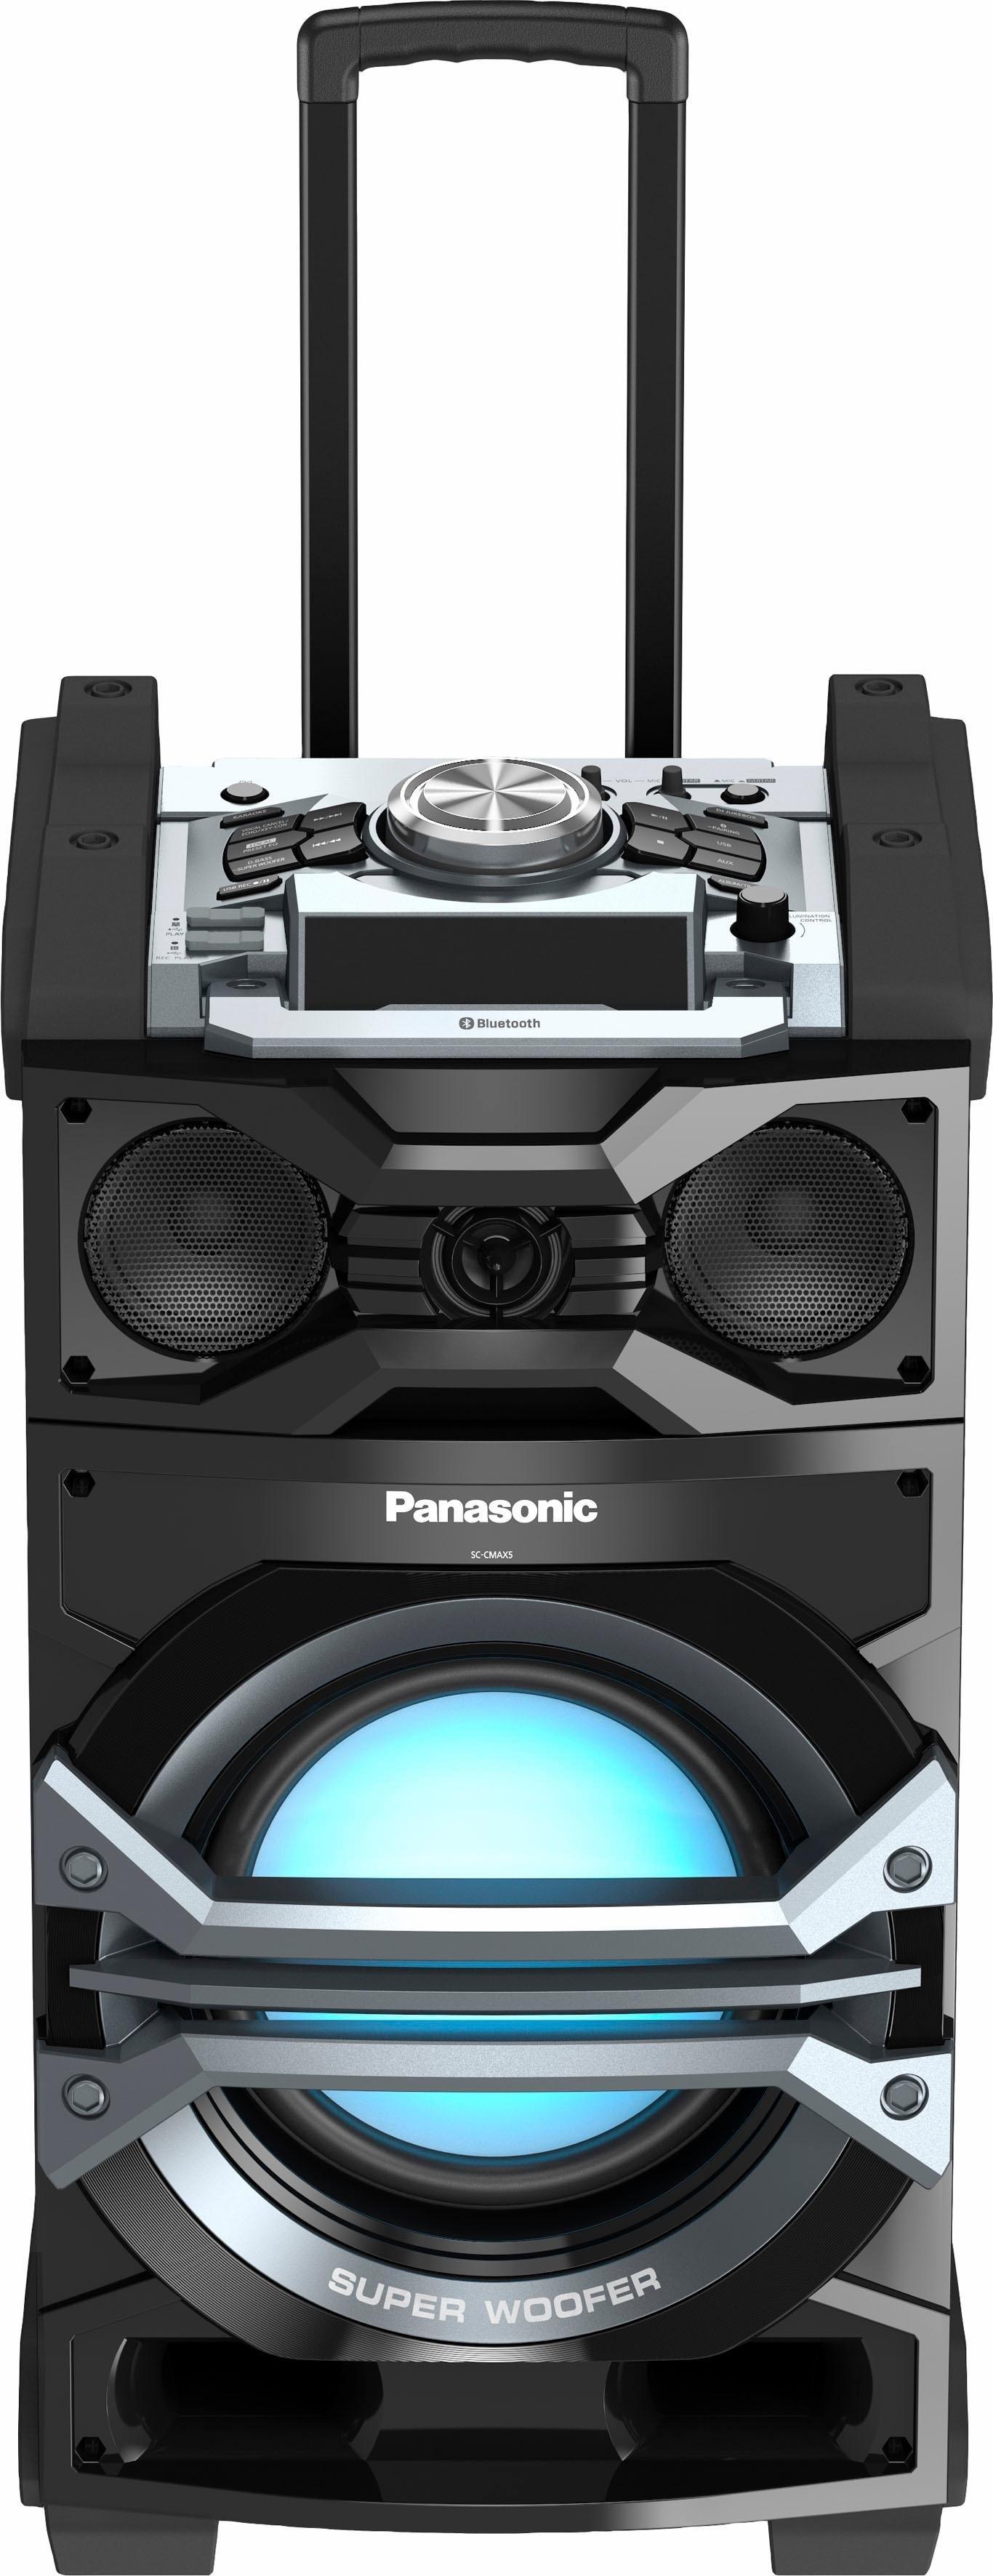 Panasonic SC-CMAX5 mini-hifi-set nu online kopen bij OTTO